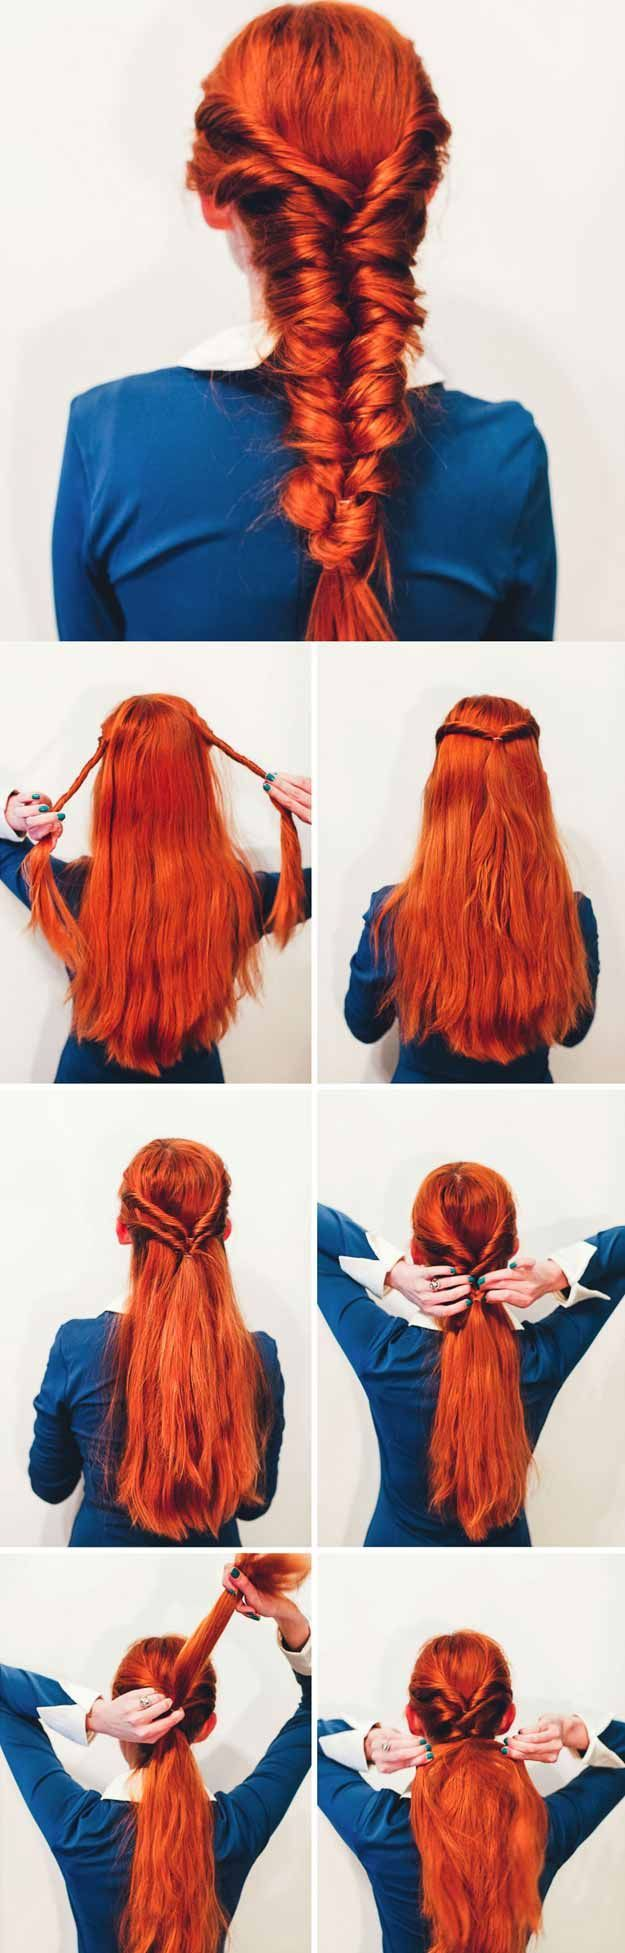 33 Best Hairstyles for Teens - The Goddess   Medium length ...